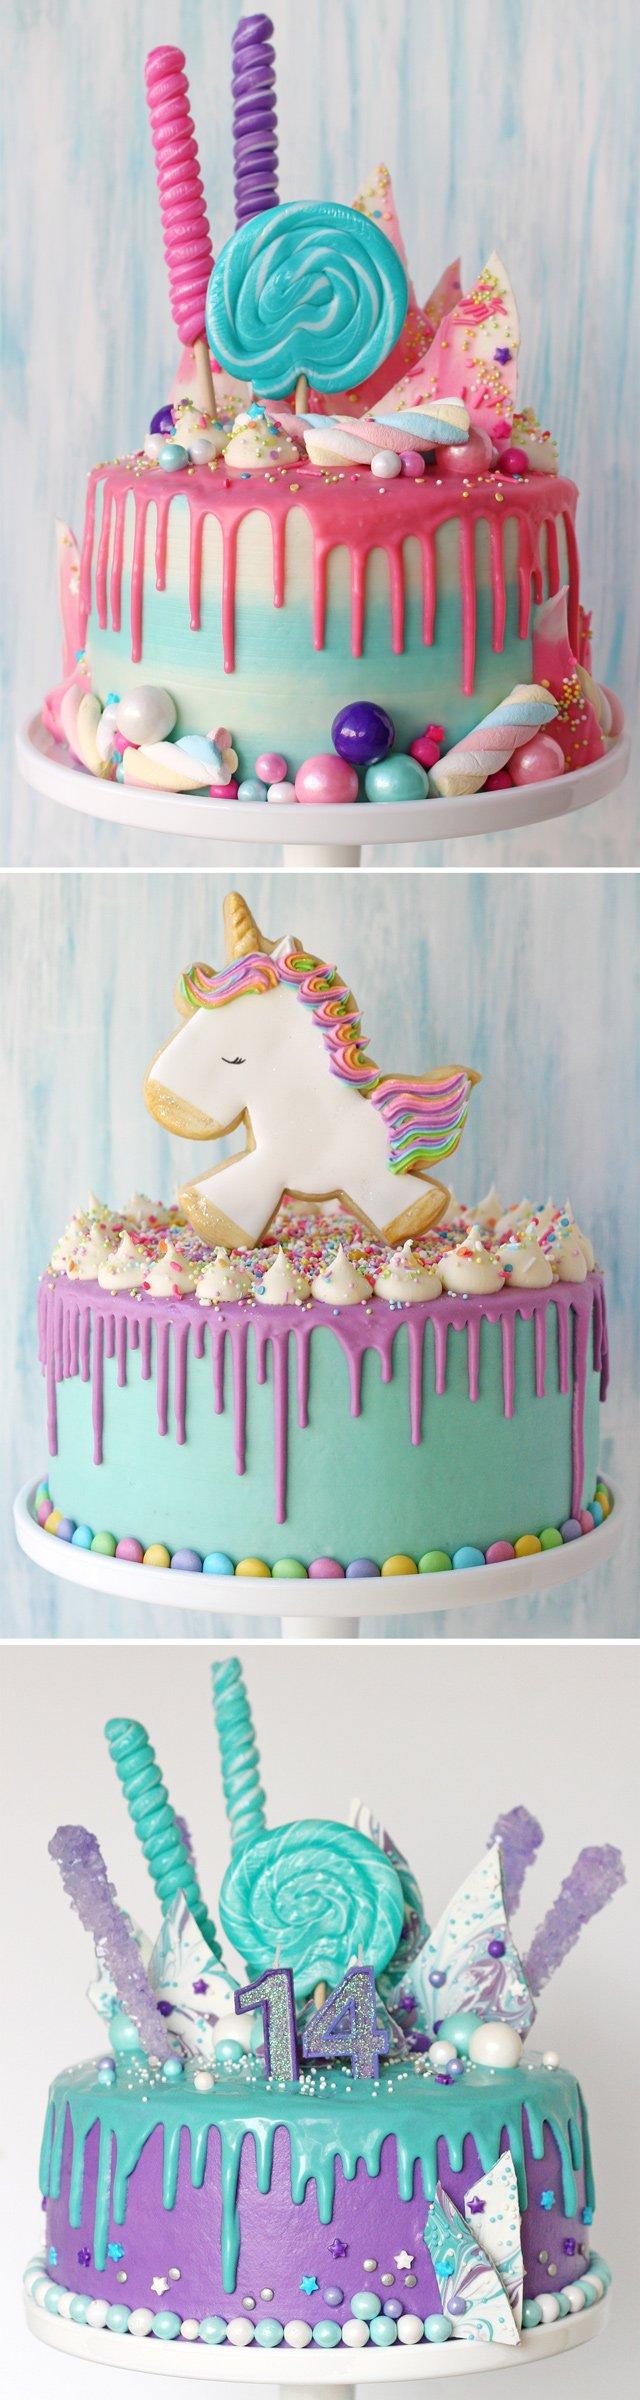 Stupendous Drip Birthday Cakes Glorious Treats Funny Birthday Cards Online Overcheapnameinfo